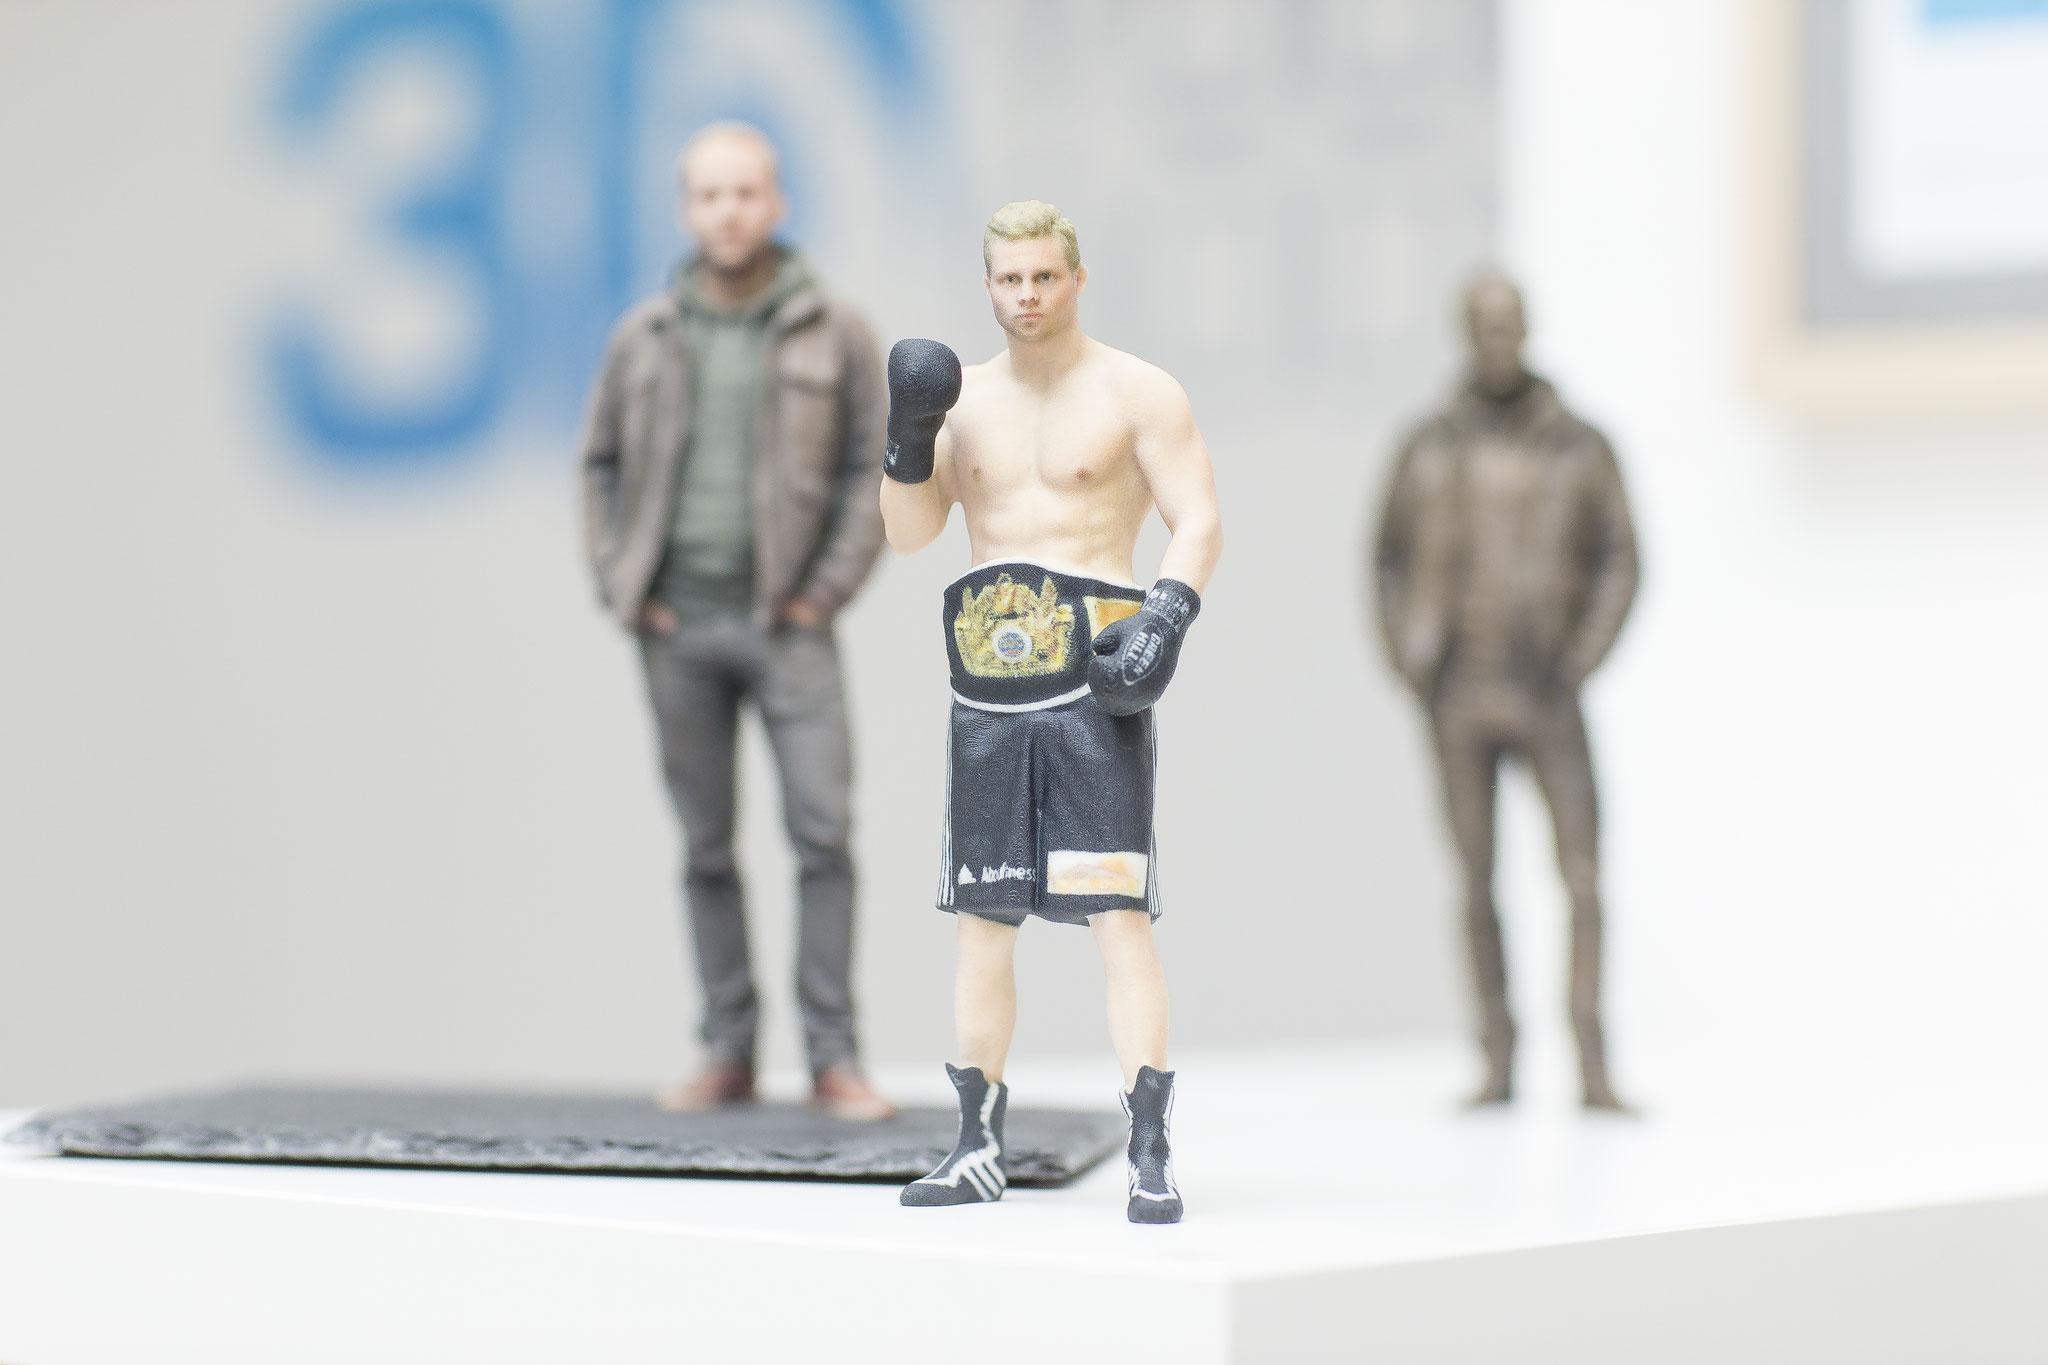 3D-Fotostudios in Berlin, München, Köln, Rostock und Dresden